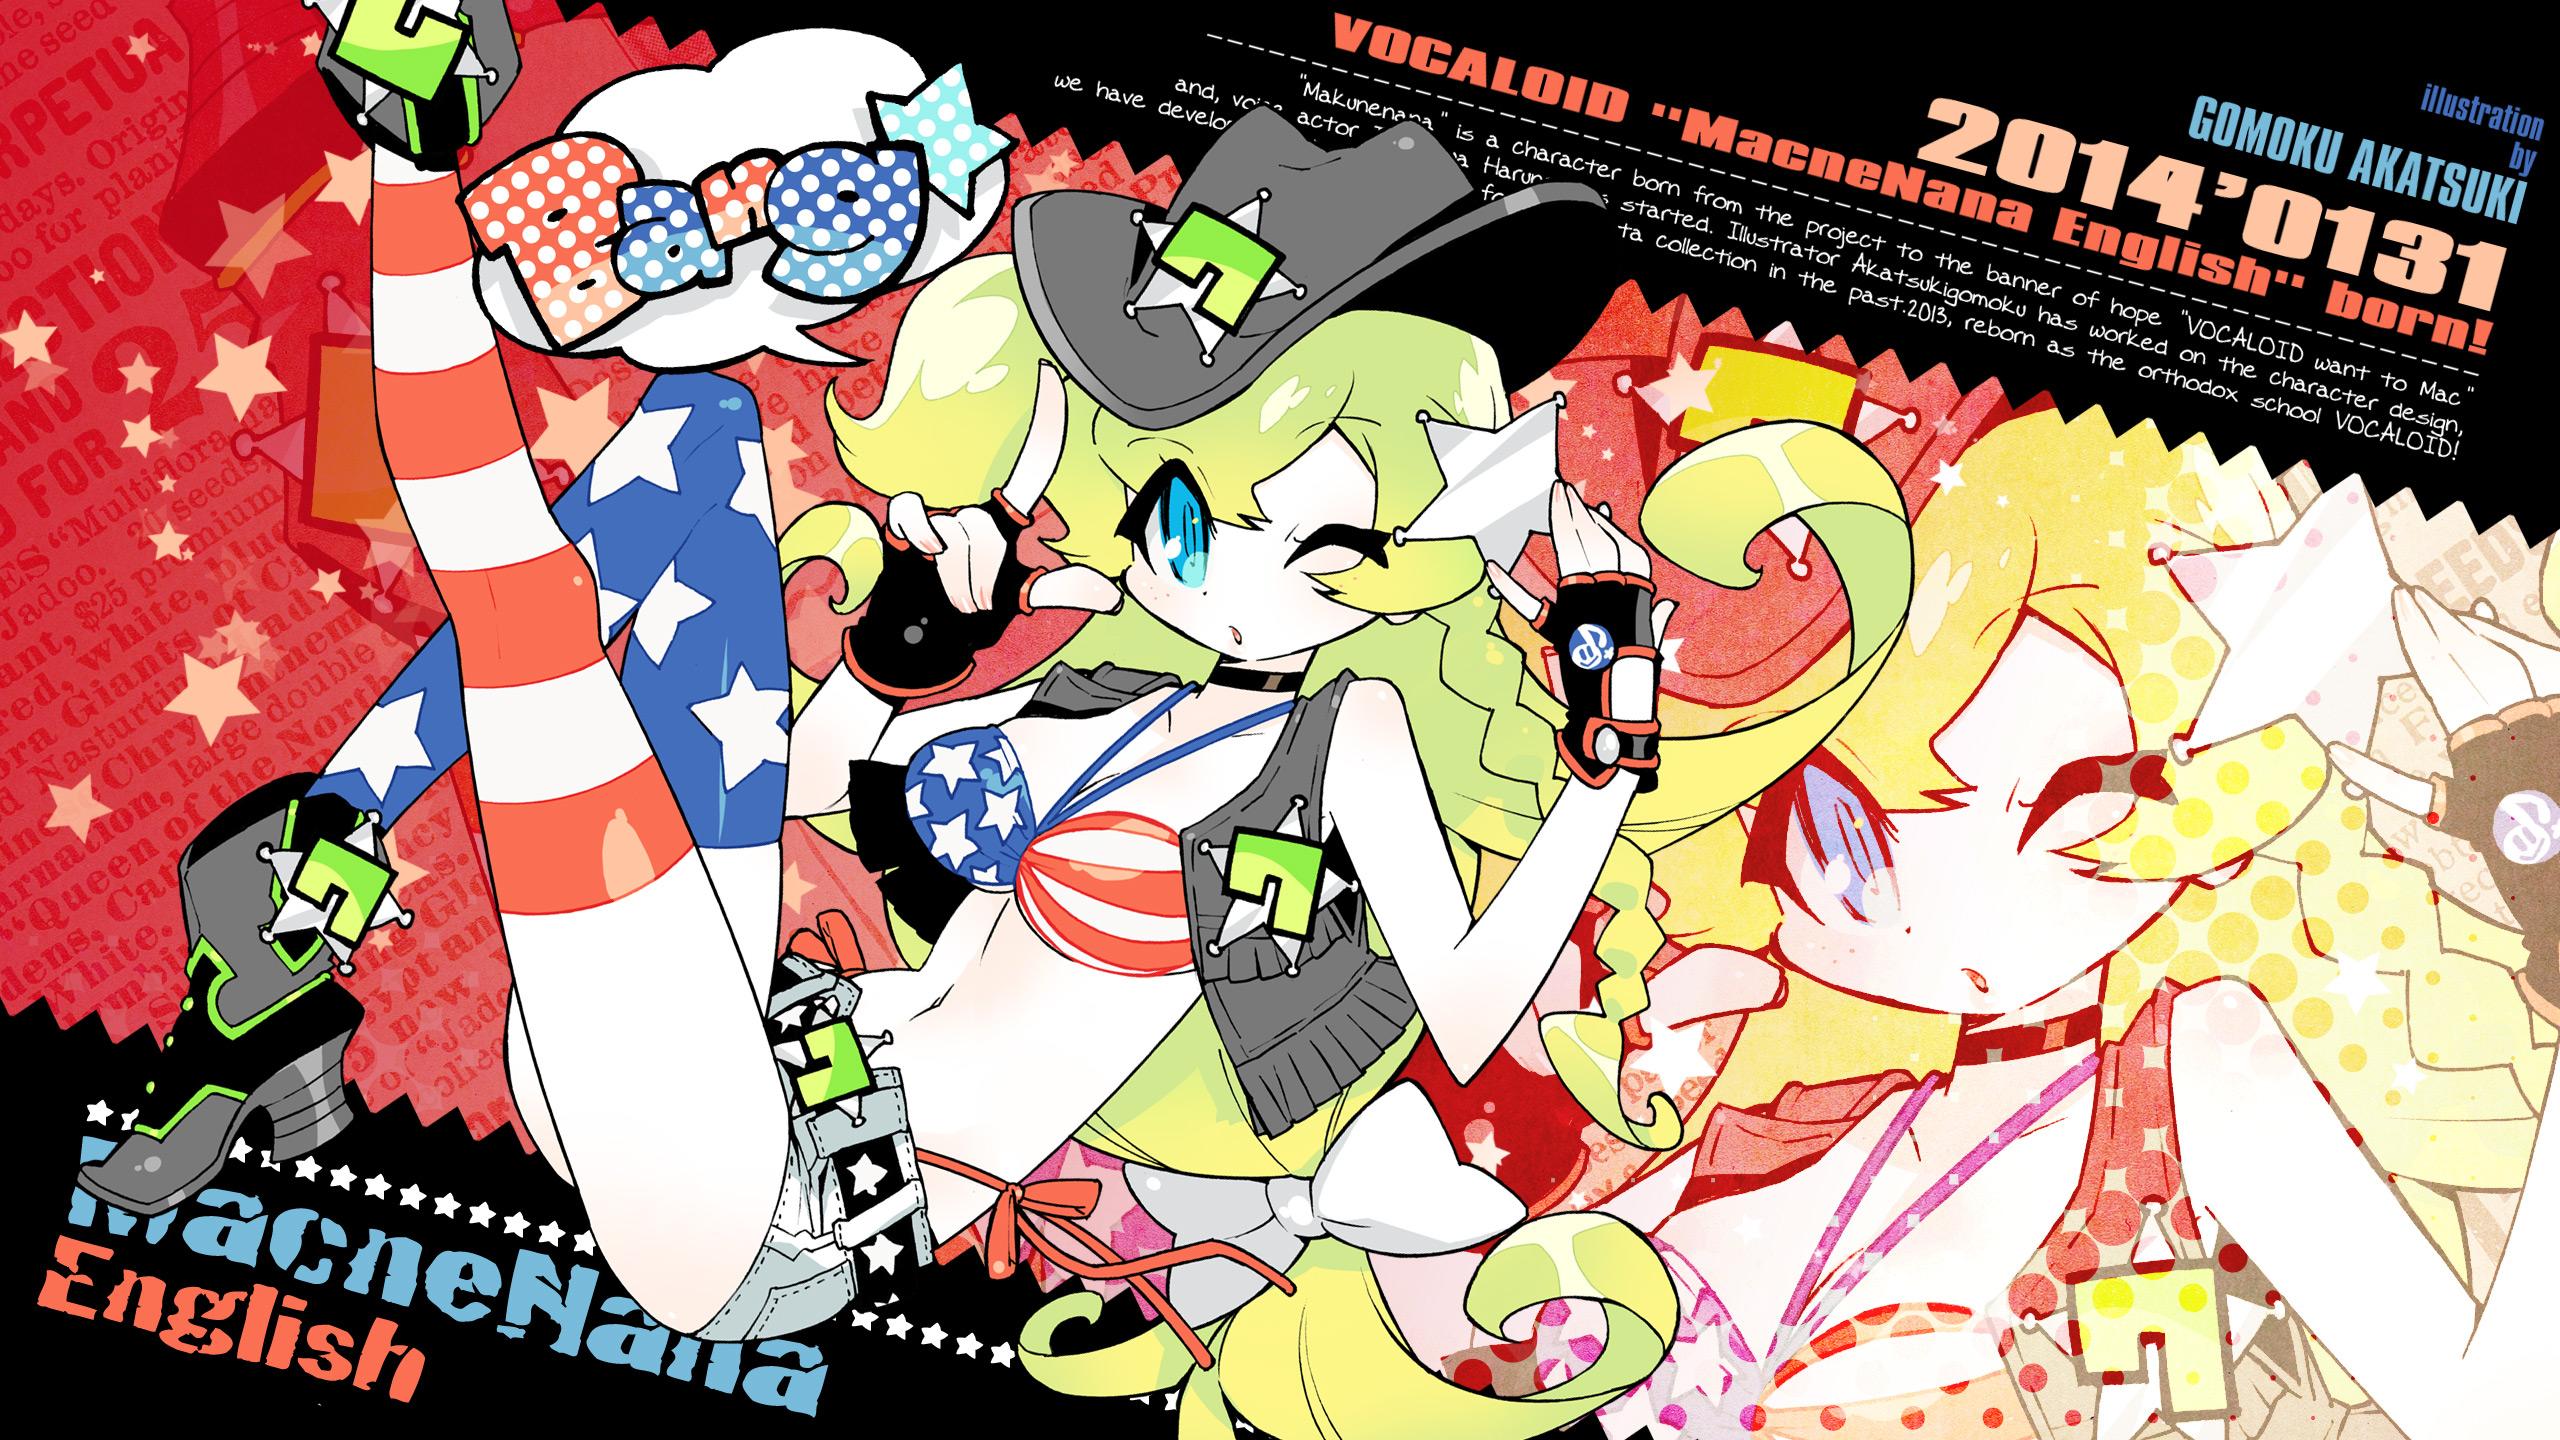 Wallpaper Macloid Vocaloid Gomoku Akatsuki 2560x1440 Images, Photos, Reviews